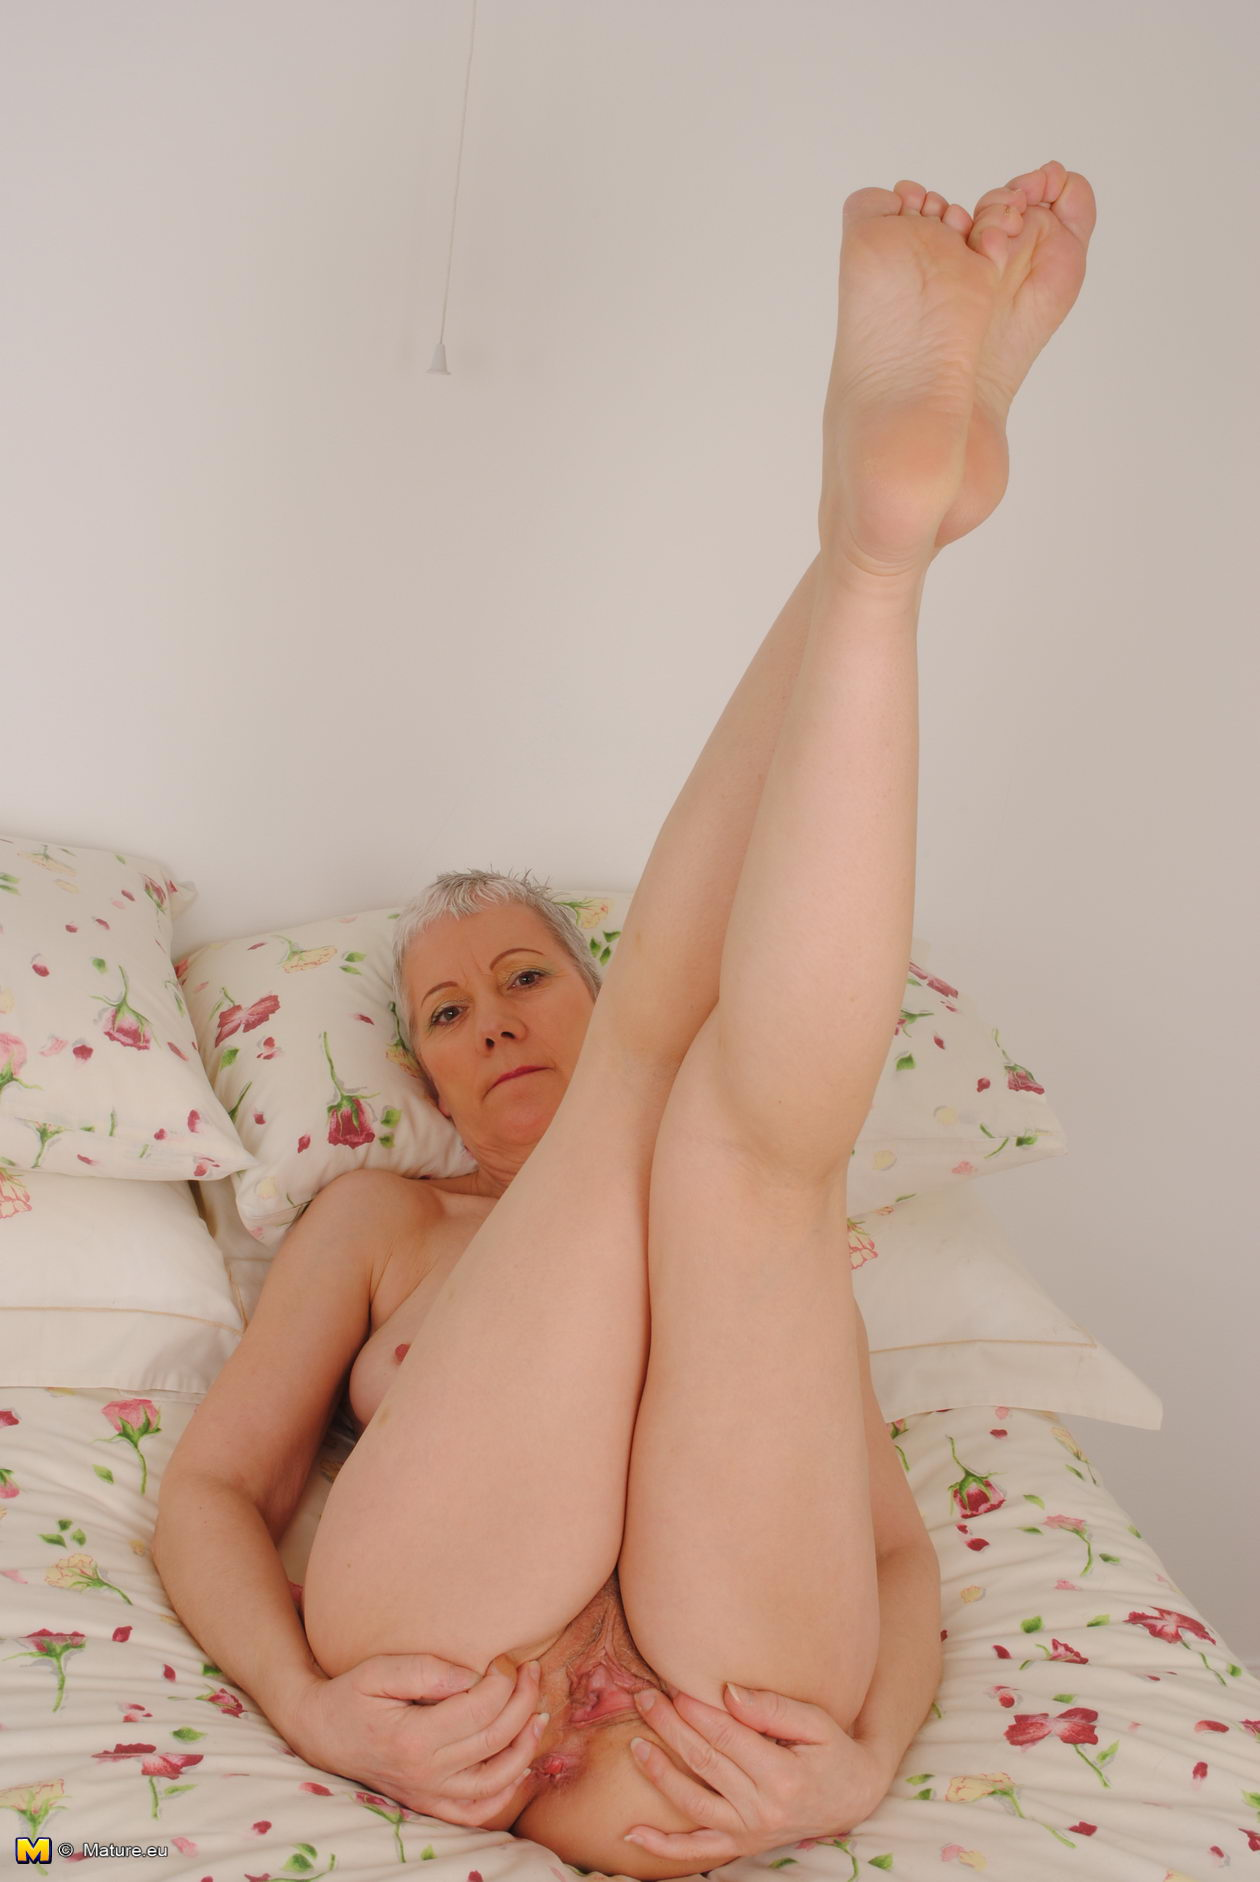 Not absolutely horny slut strip tease share